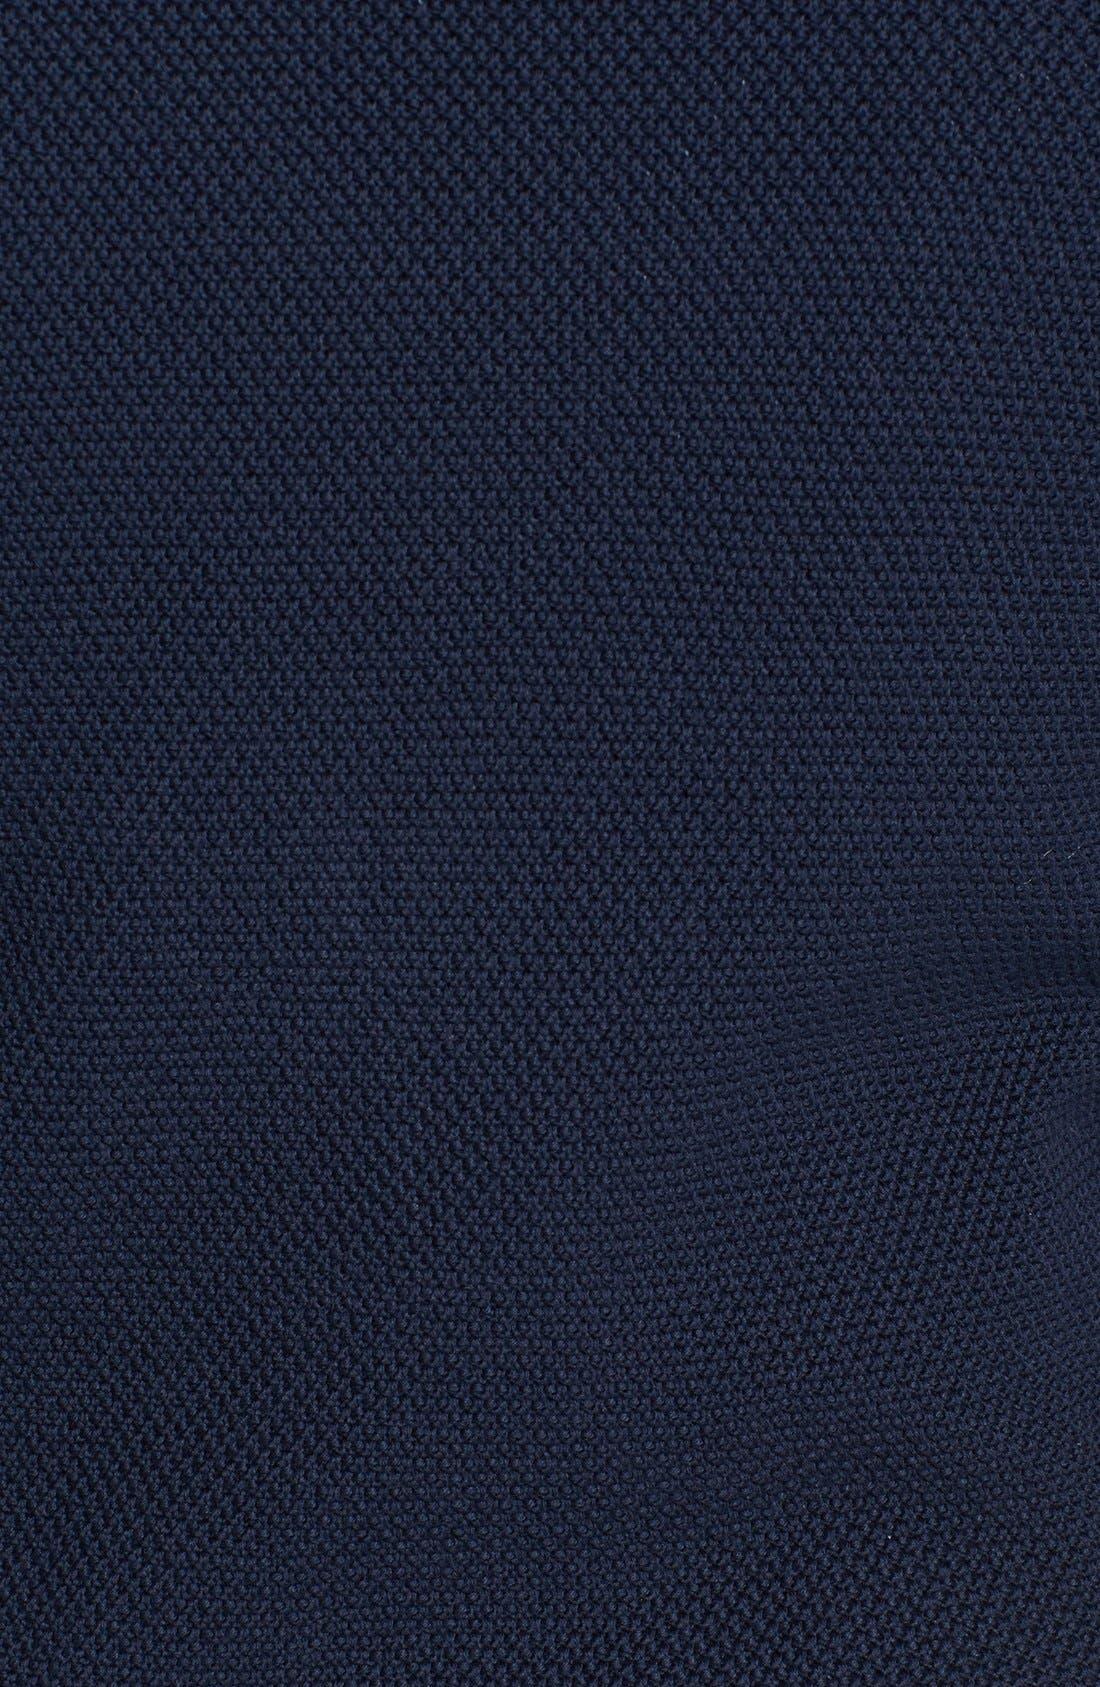 Alternate Image 3  - BOSS HUGO BOSS 'Pivot' Slim Fit Shawl Collar Sweater